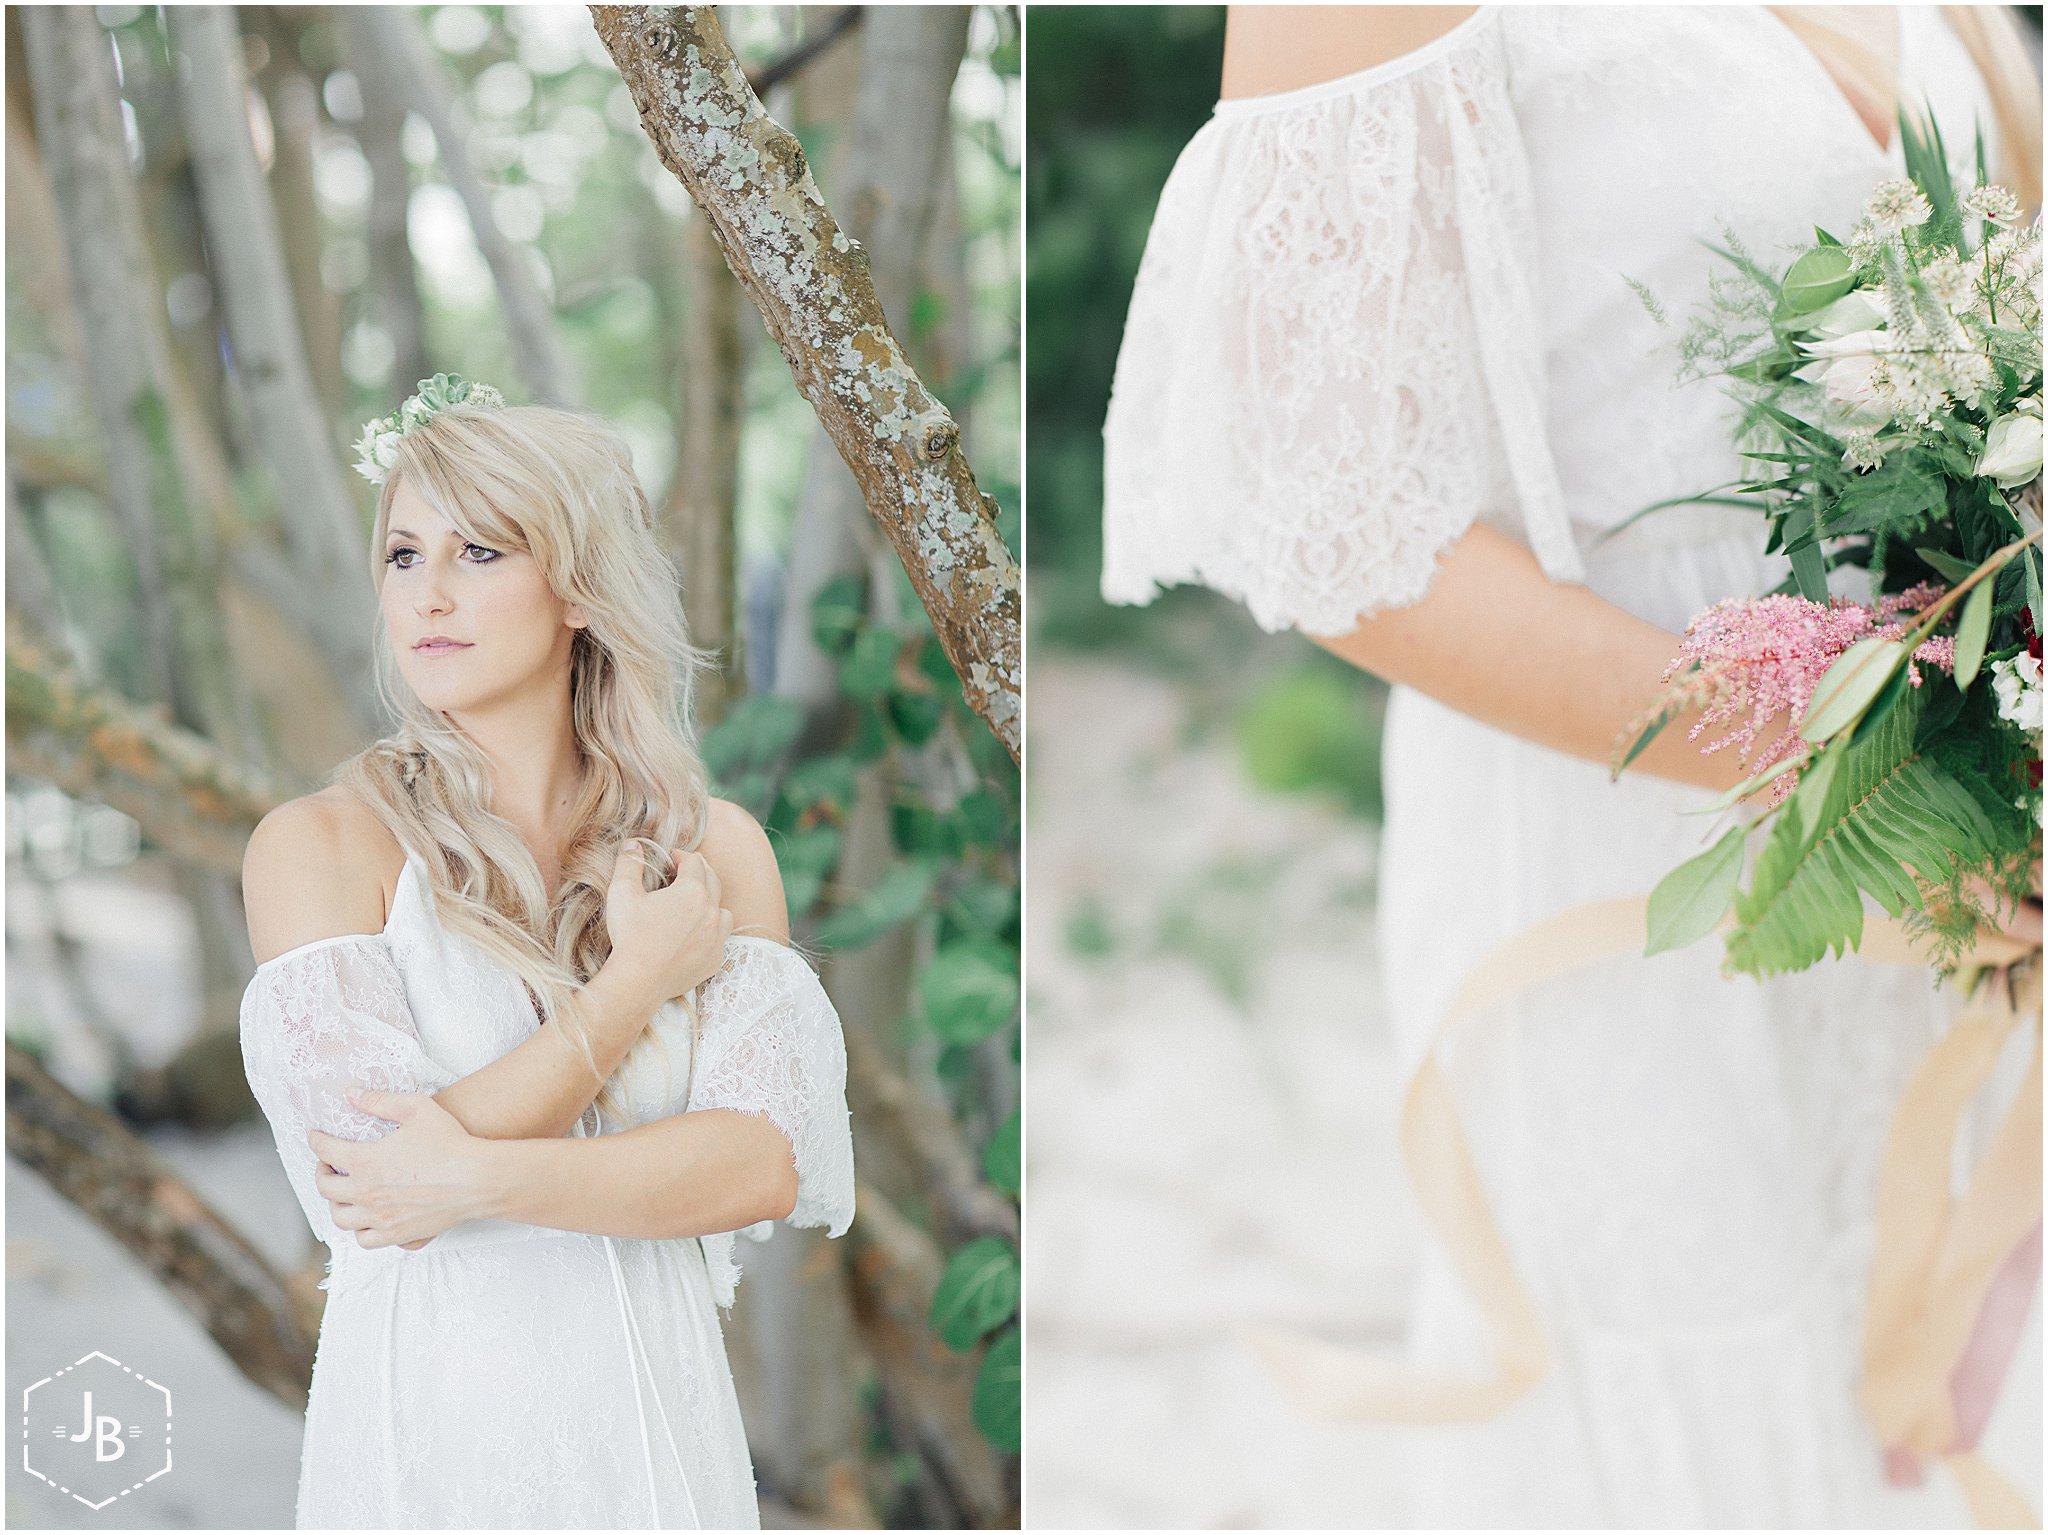 WeddingandEngagementFloridaPhotographer_1343.jpg